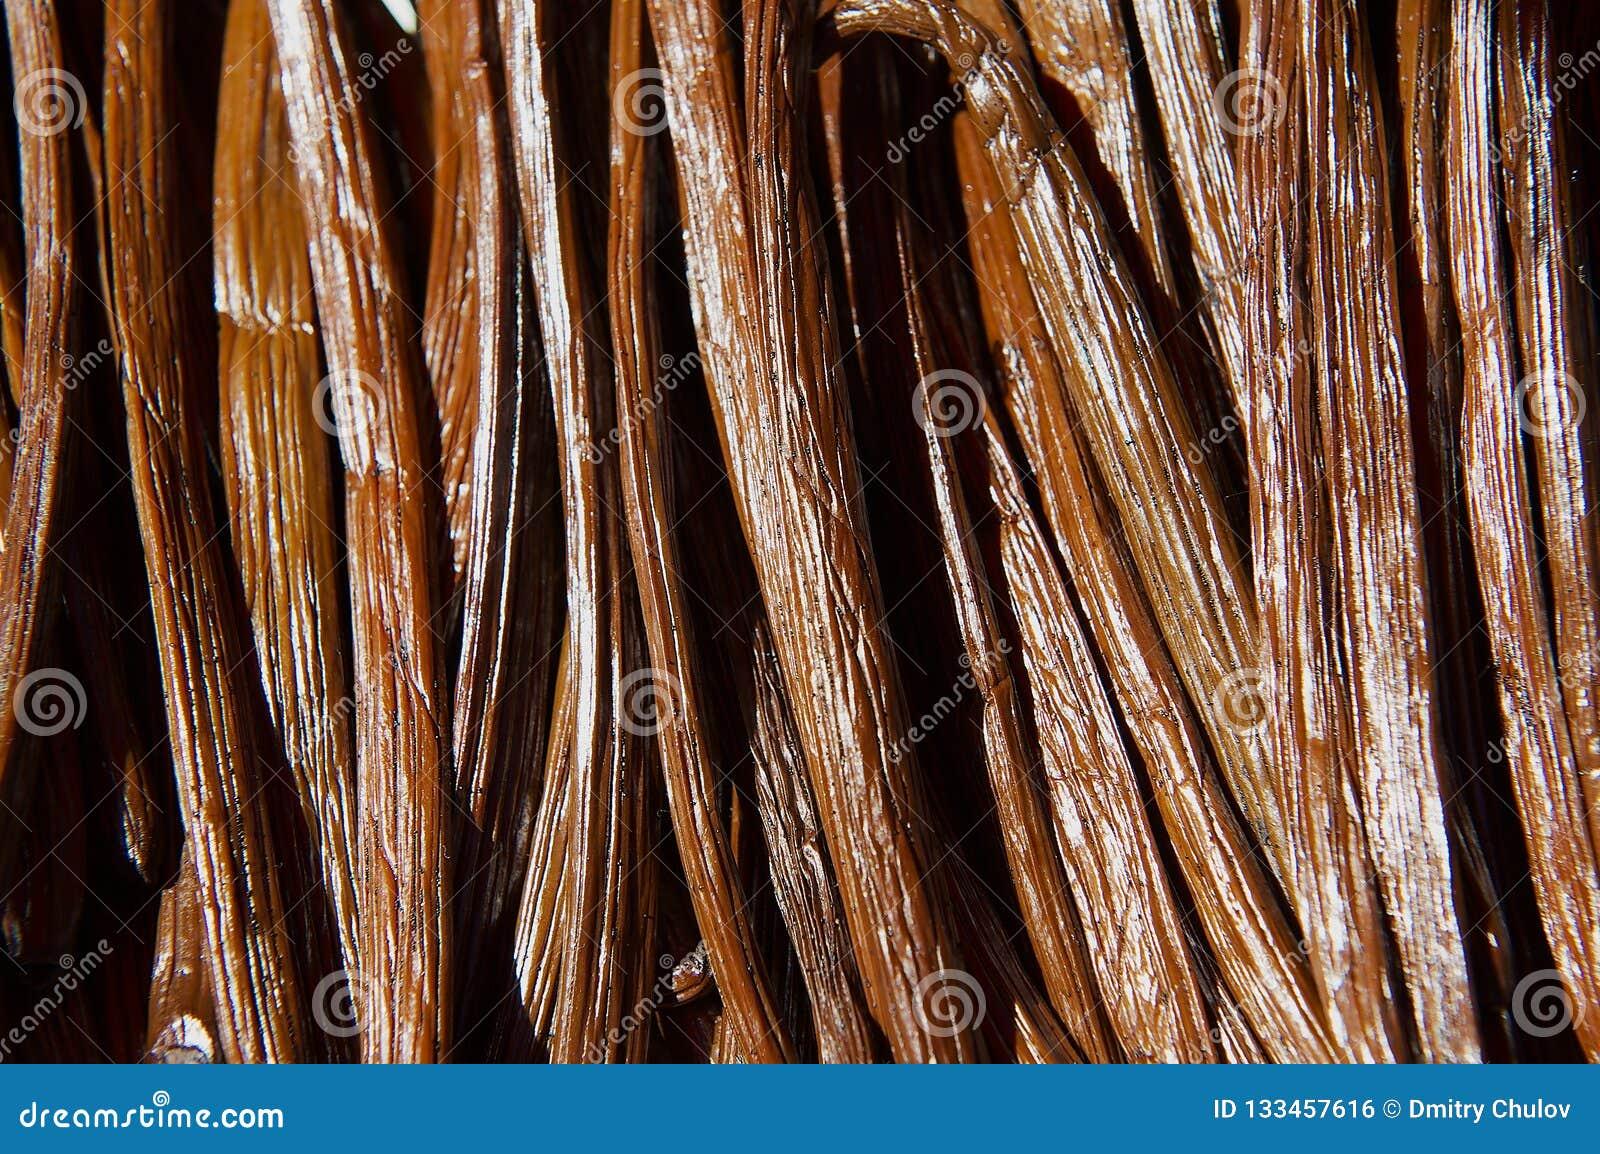 Vanilla dry fruit in the fermentation process for grading vanilla flavor at La Reunion island.